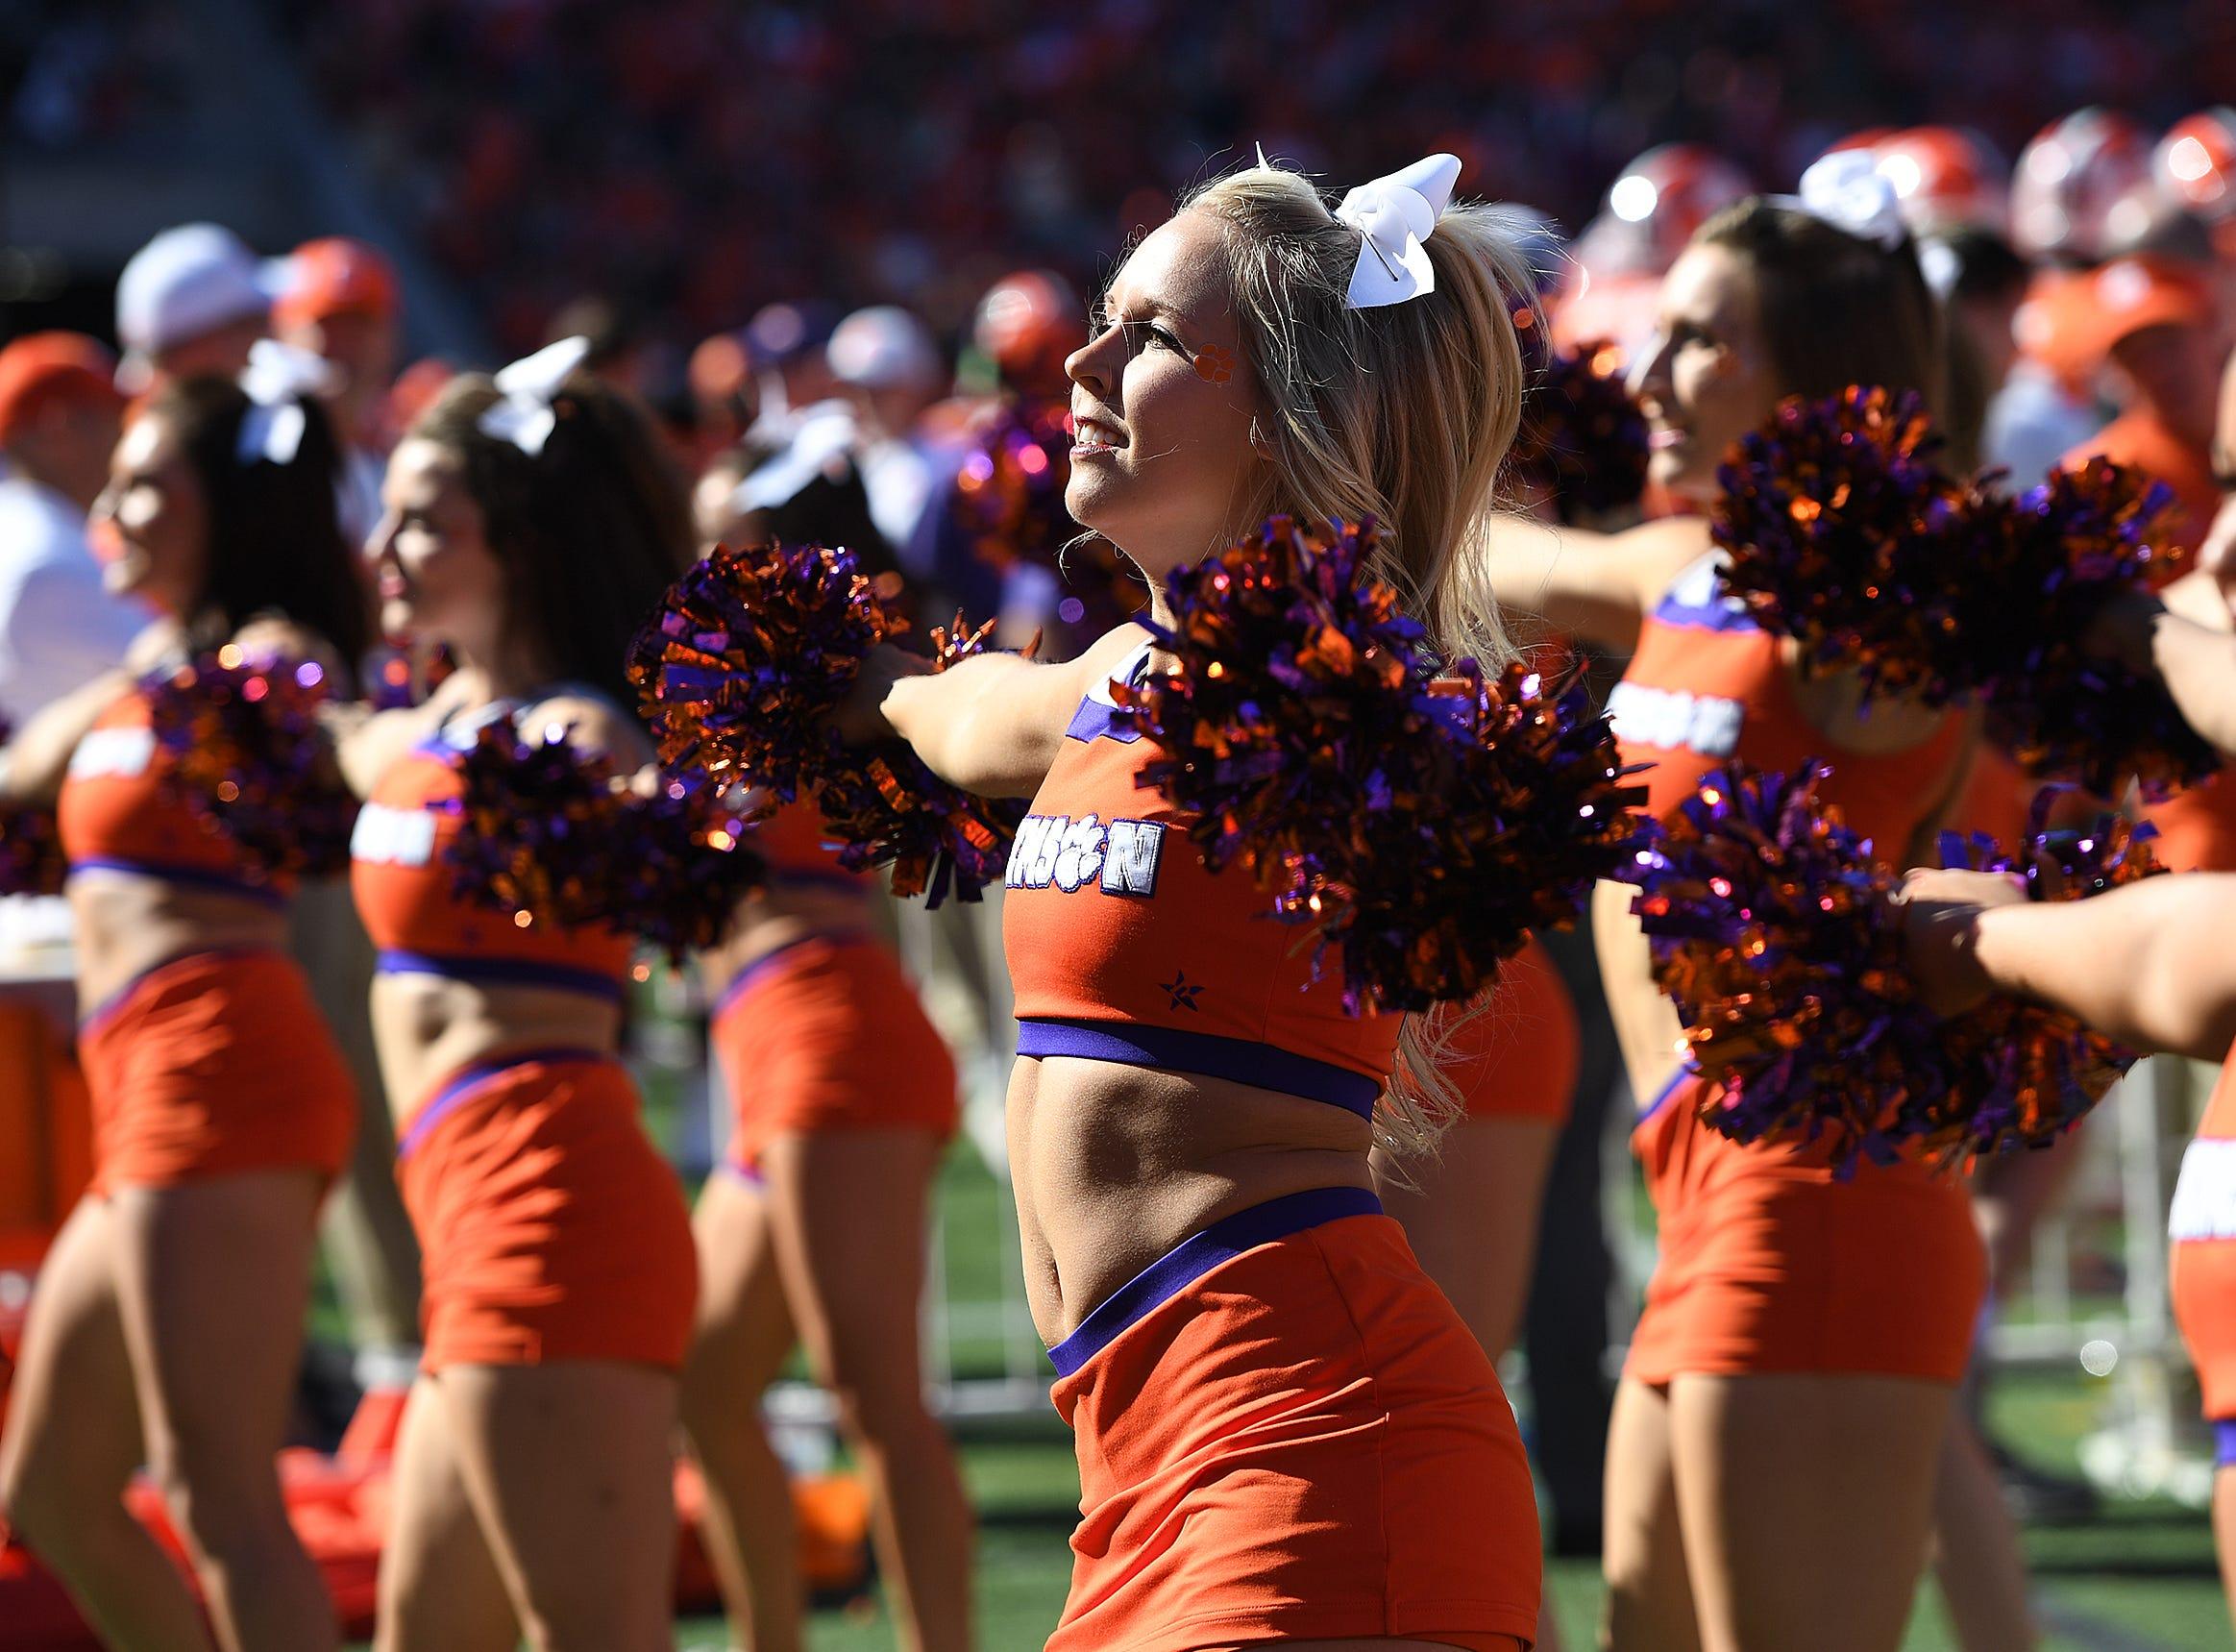 Clemson's cheerleaders during the 3rd quarter Saturday, November 3, 2018 at Clemson's Memorial Stadium.